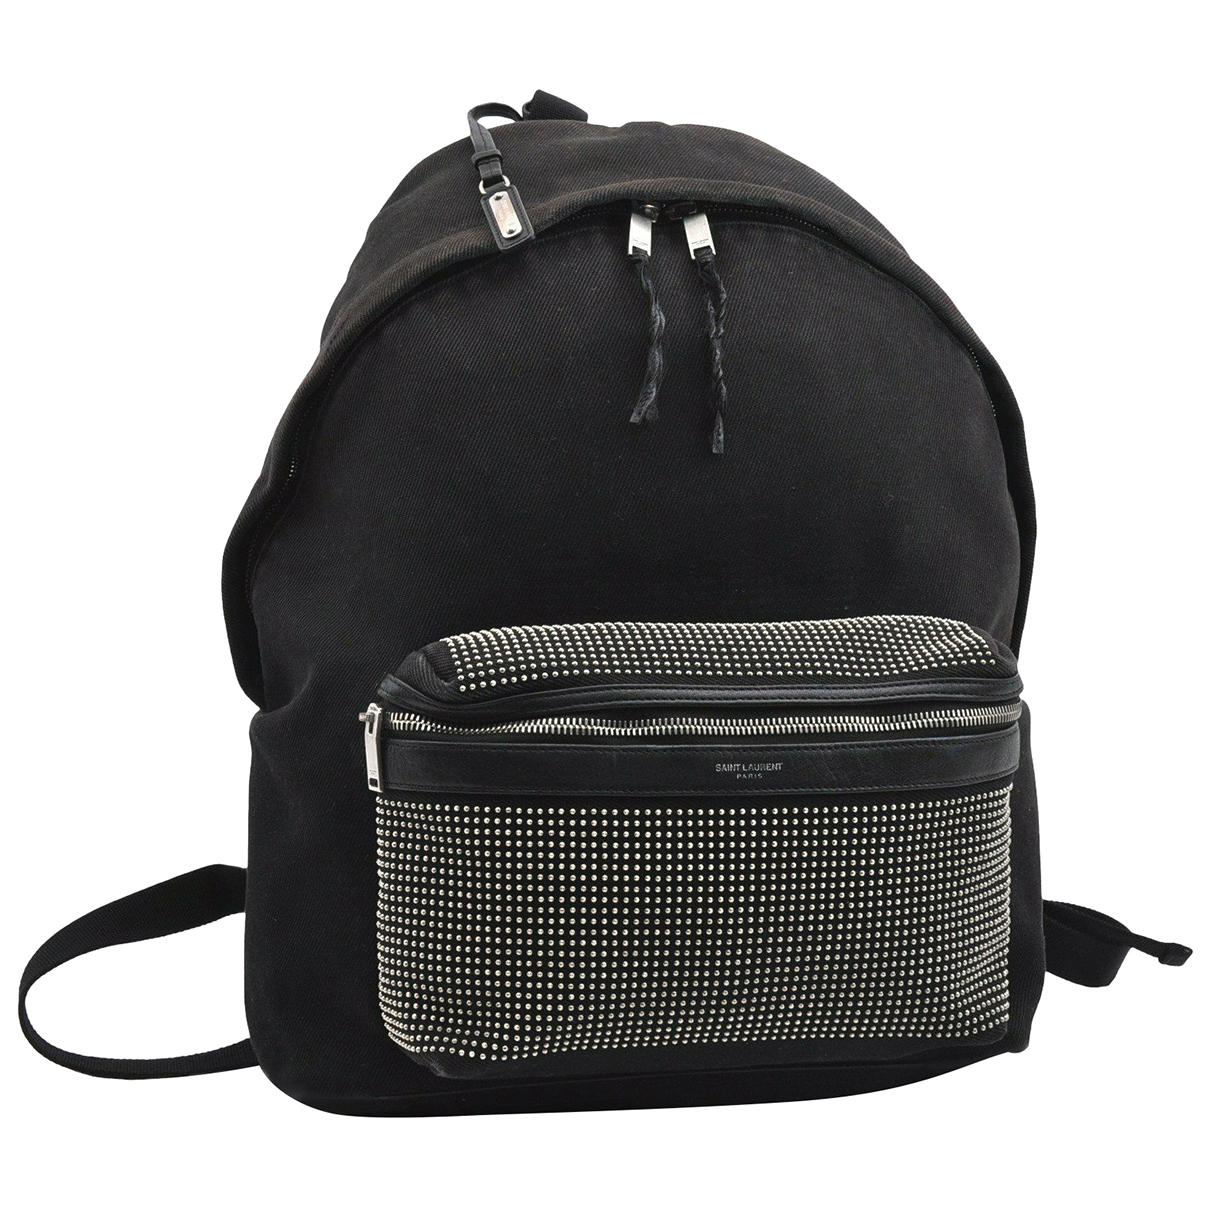 Yves Saint Laurent N Black Cloth backpack for Women N